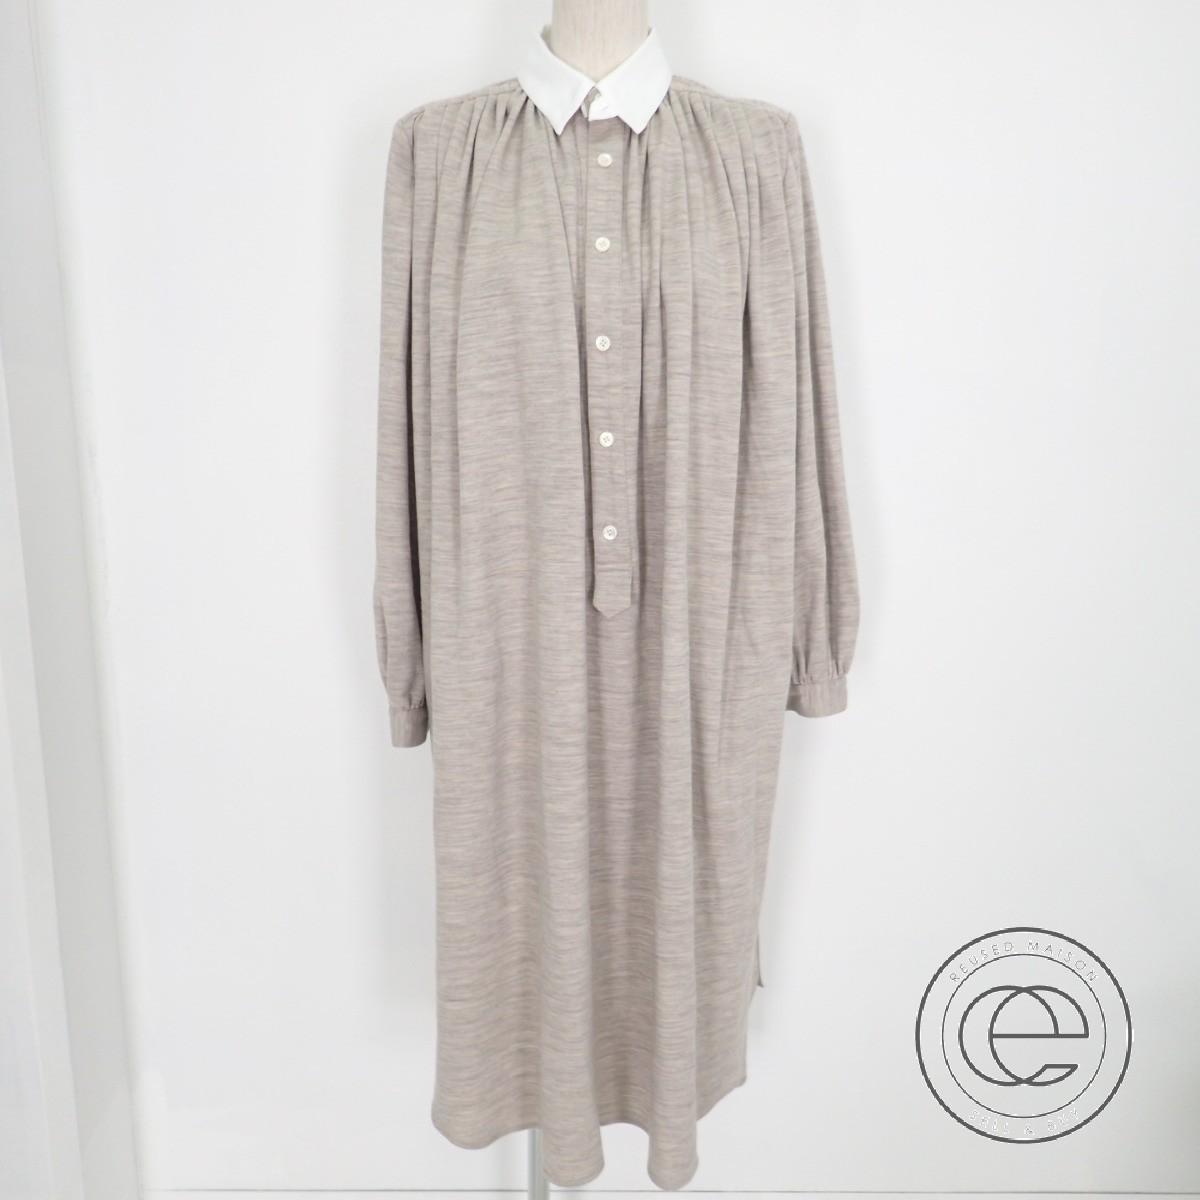 FUMIKA UCHIDA フミカウチダ FU-G-0P001 17AW WOOL PONTE NIGHT SH DRESS ウール ポンテ・ジャージー シャツワンピース 34 ベージュ レディース 【中古】